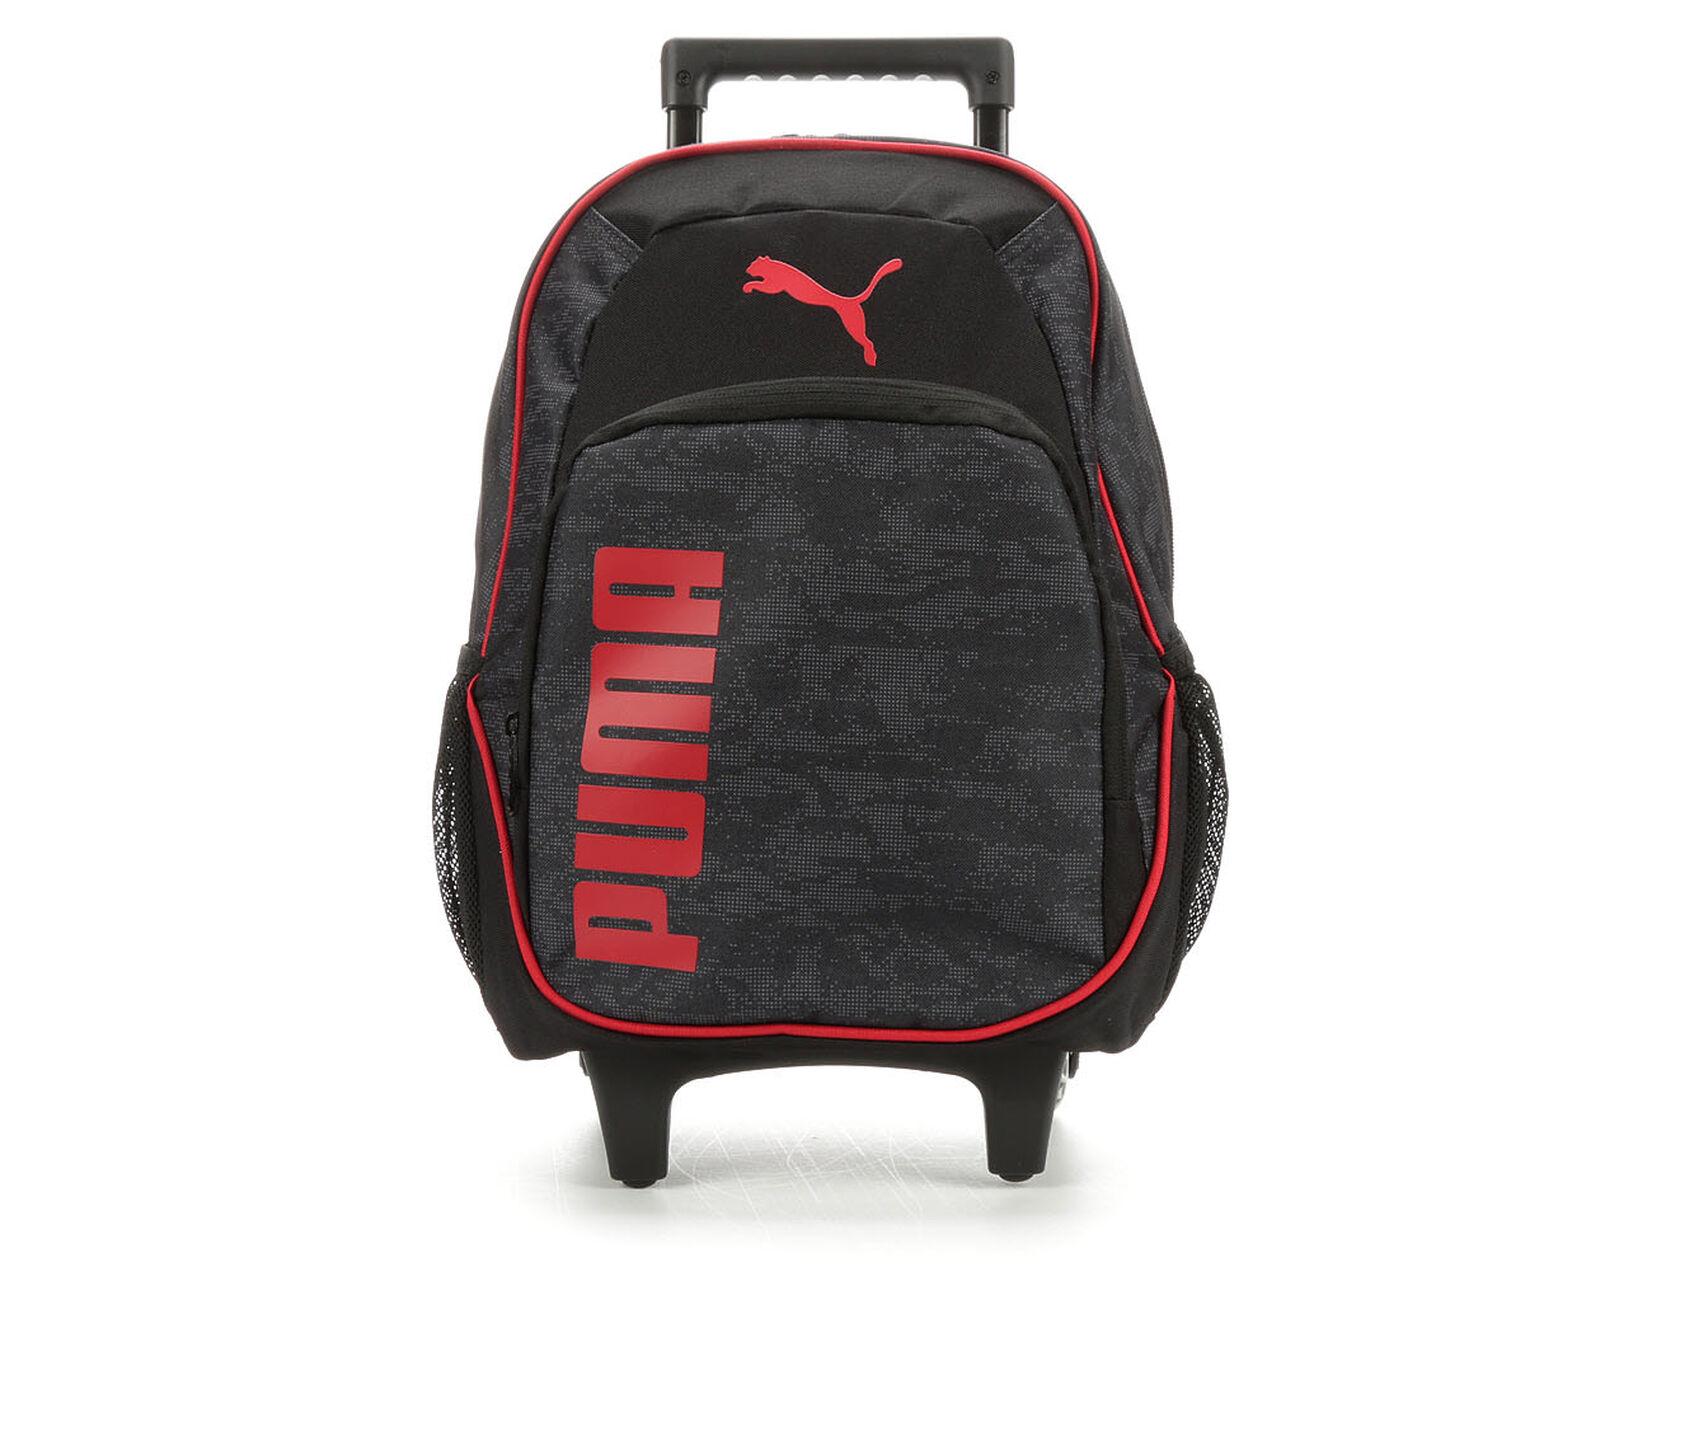 92545b71e027 Puma Axis Wheelie Kids Backpack. Carousel Controls